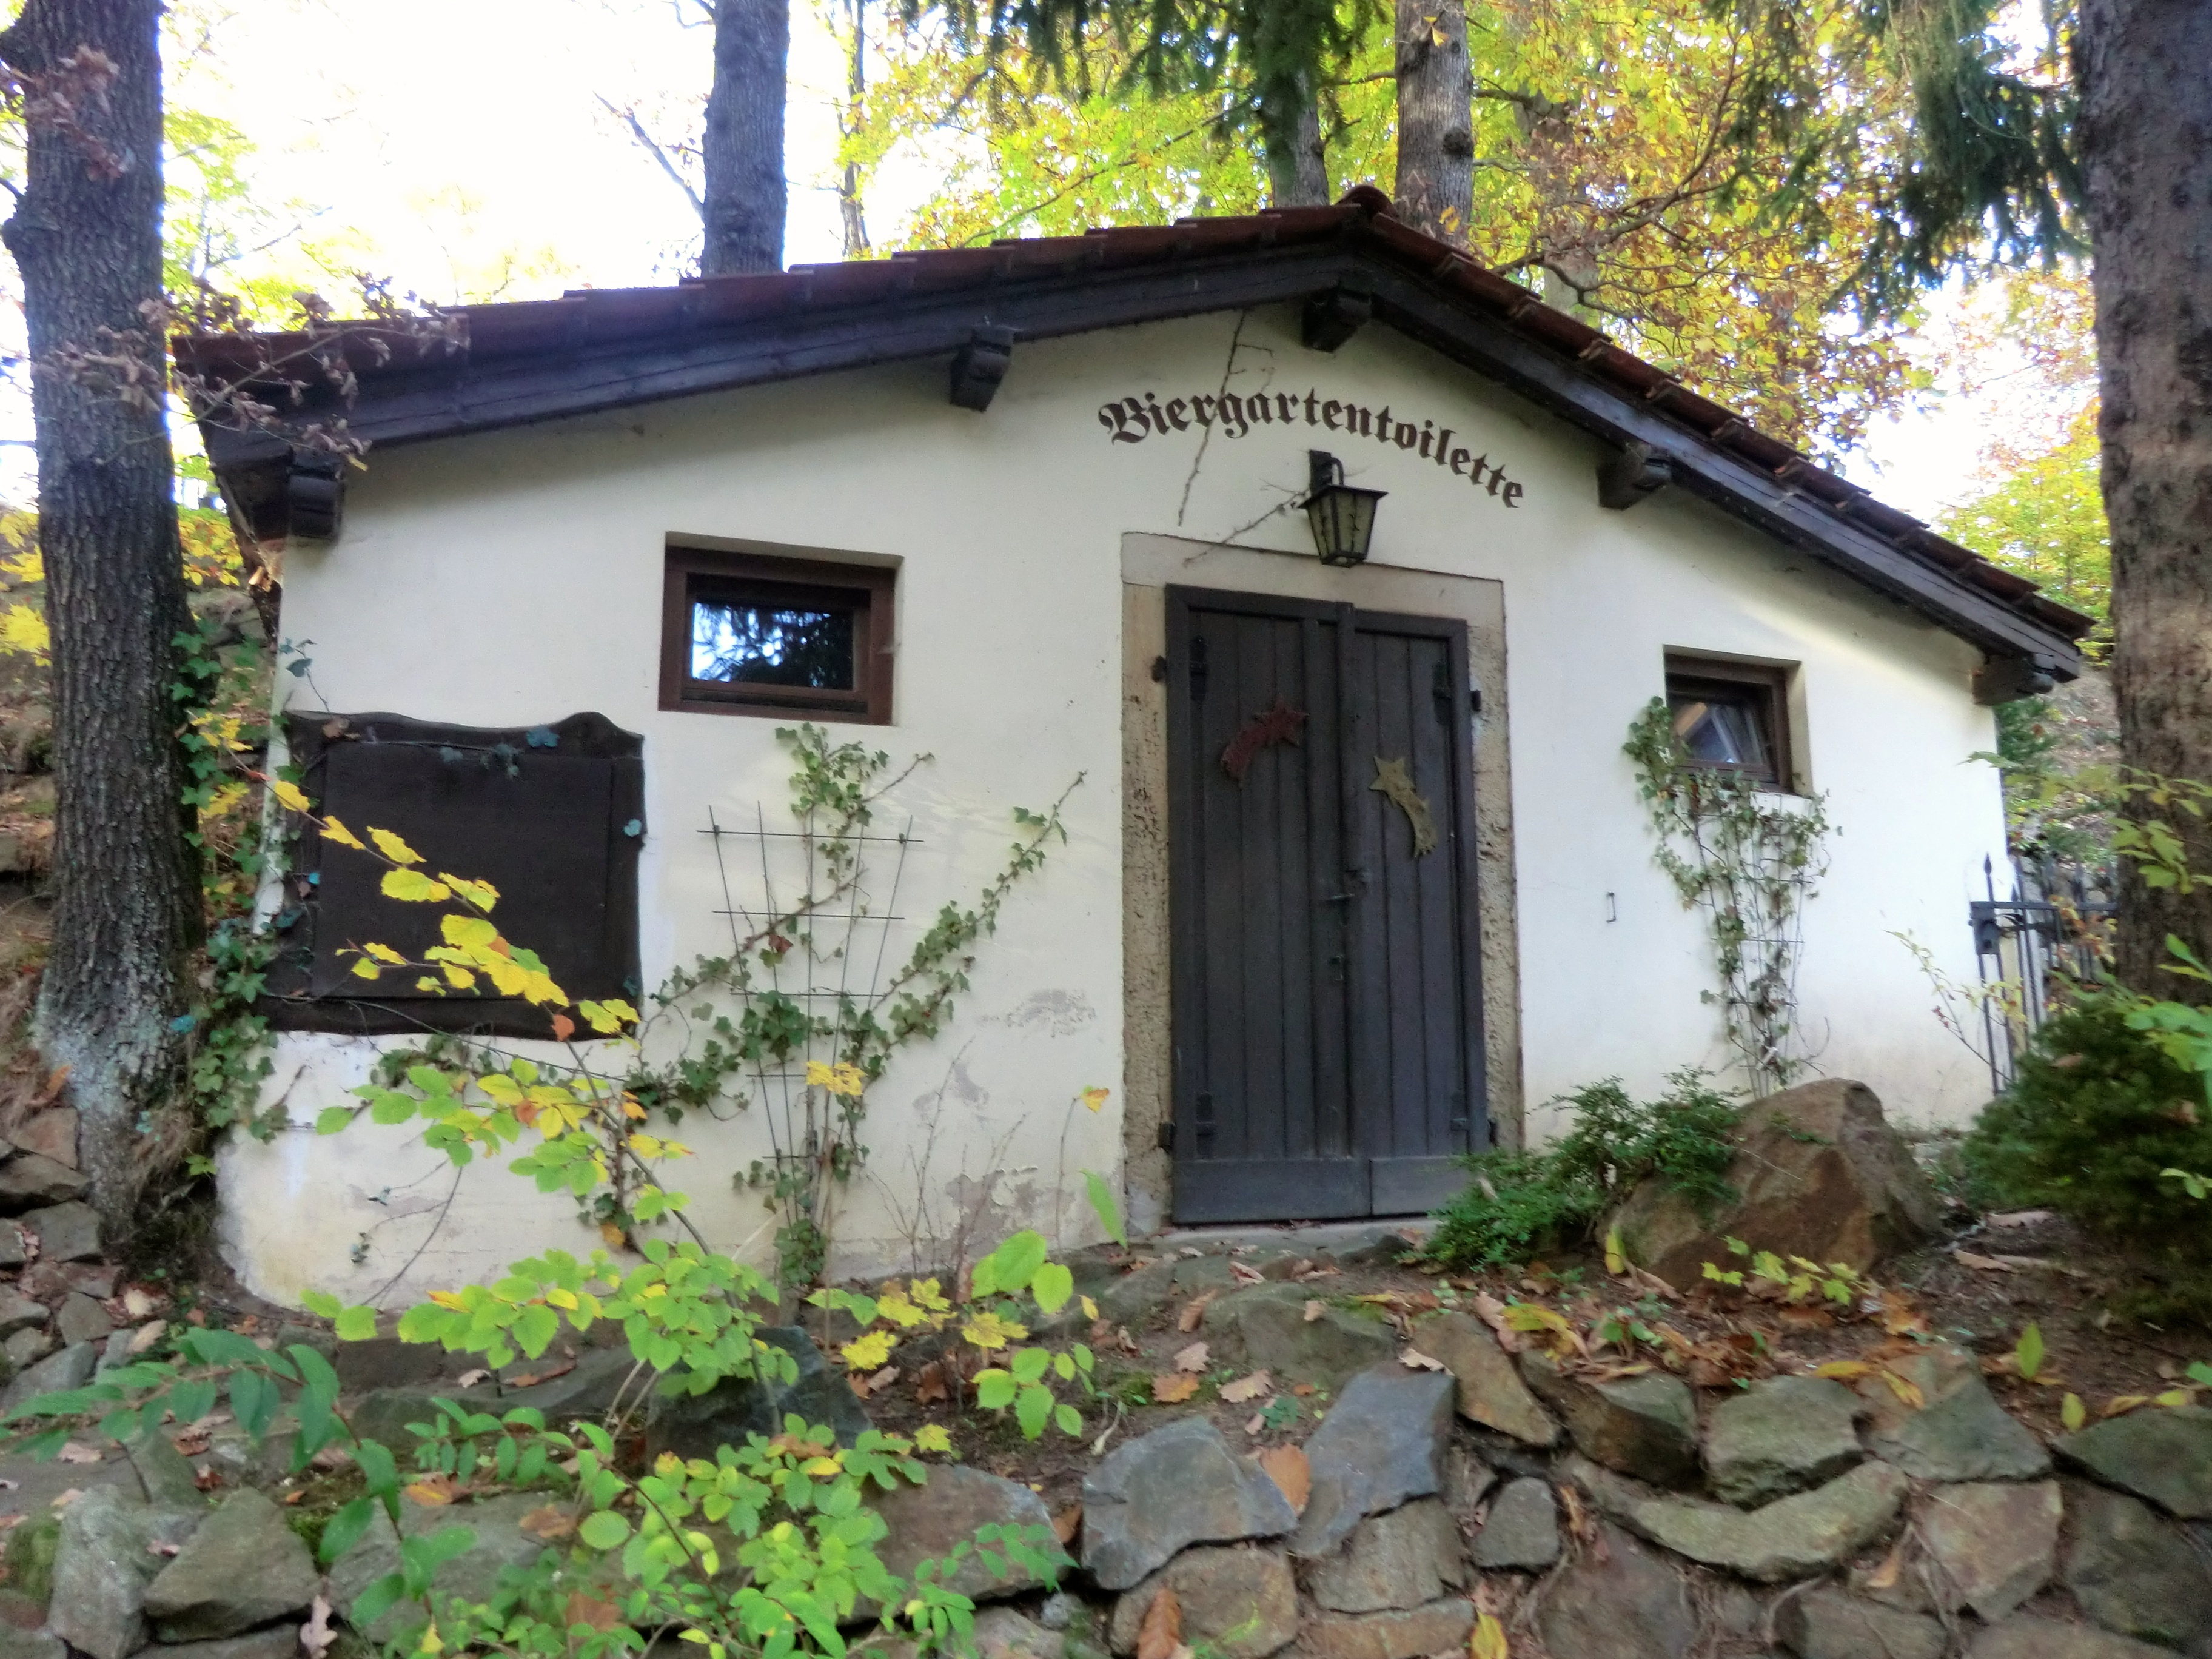 File:Biergartentoilette Wachbergschänke Wachwitz.jpg - Wikimedia Commons